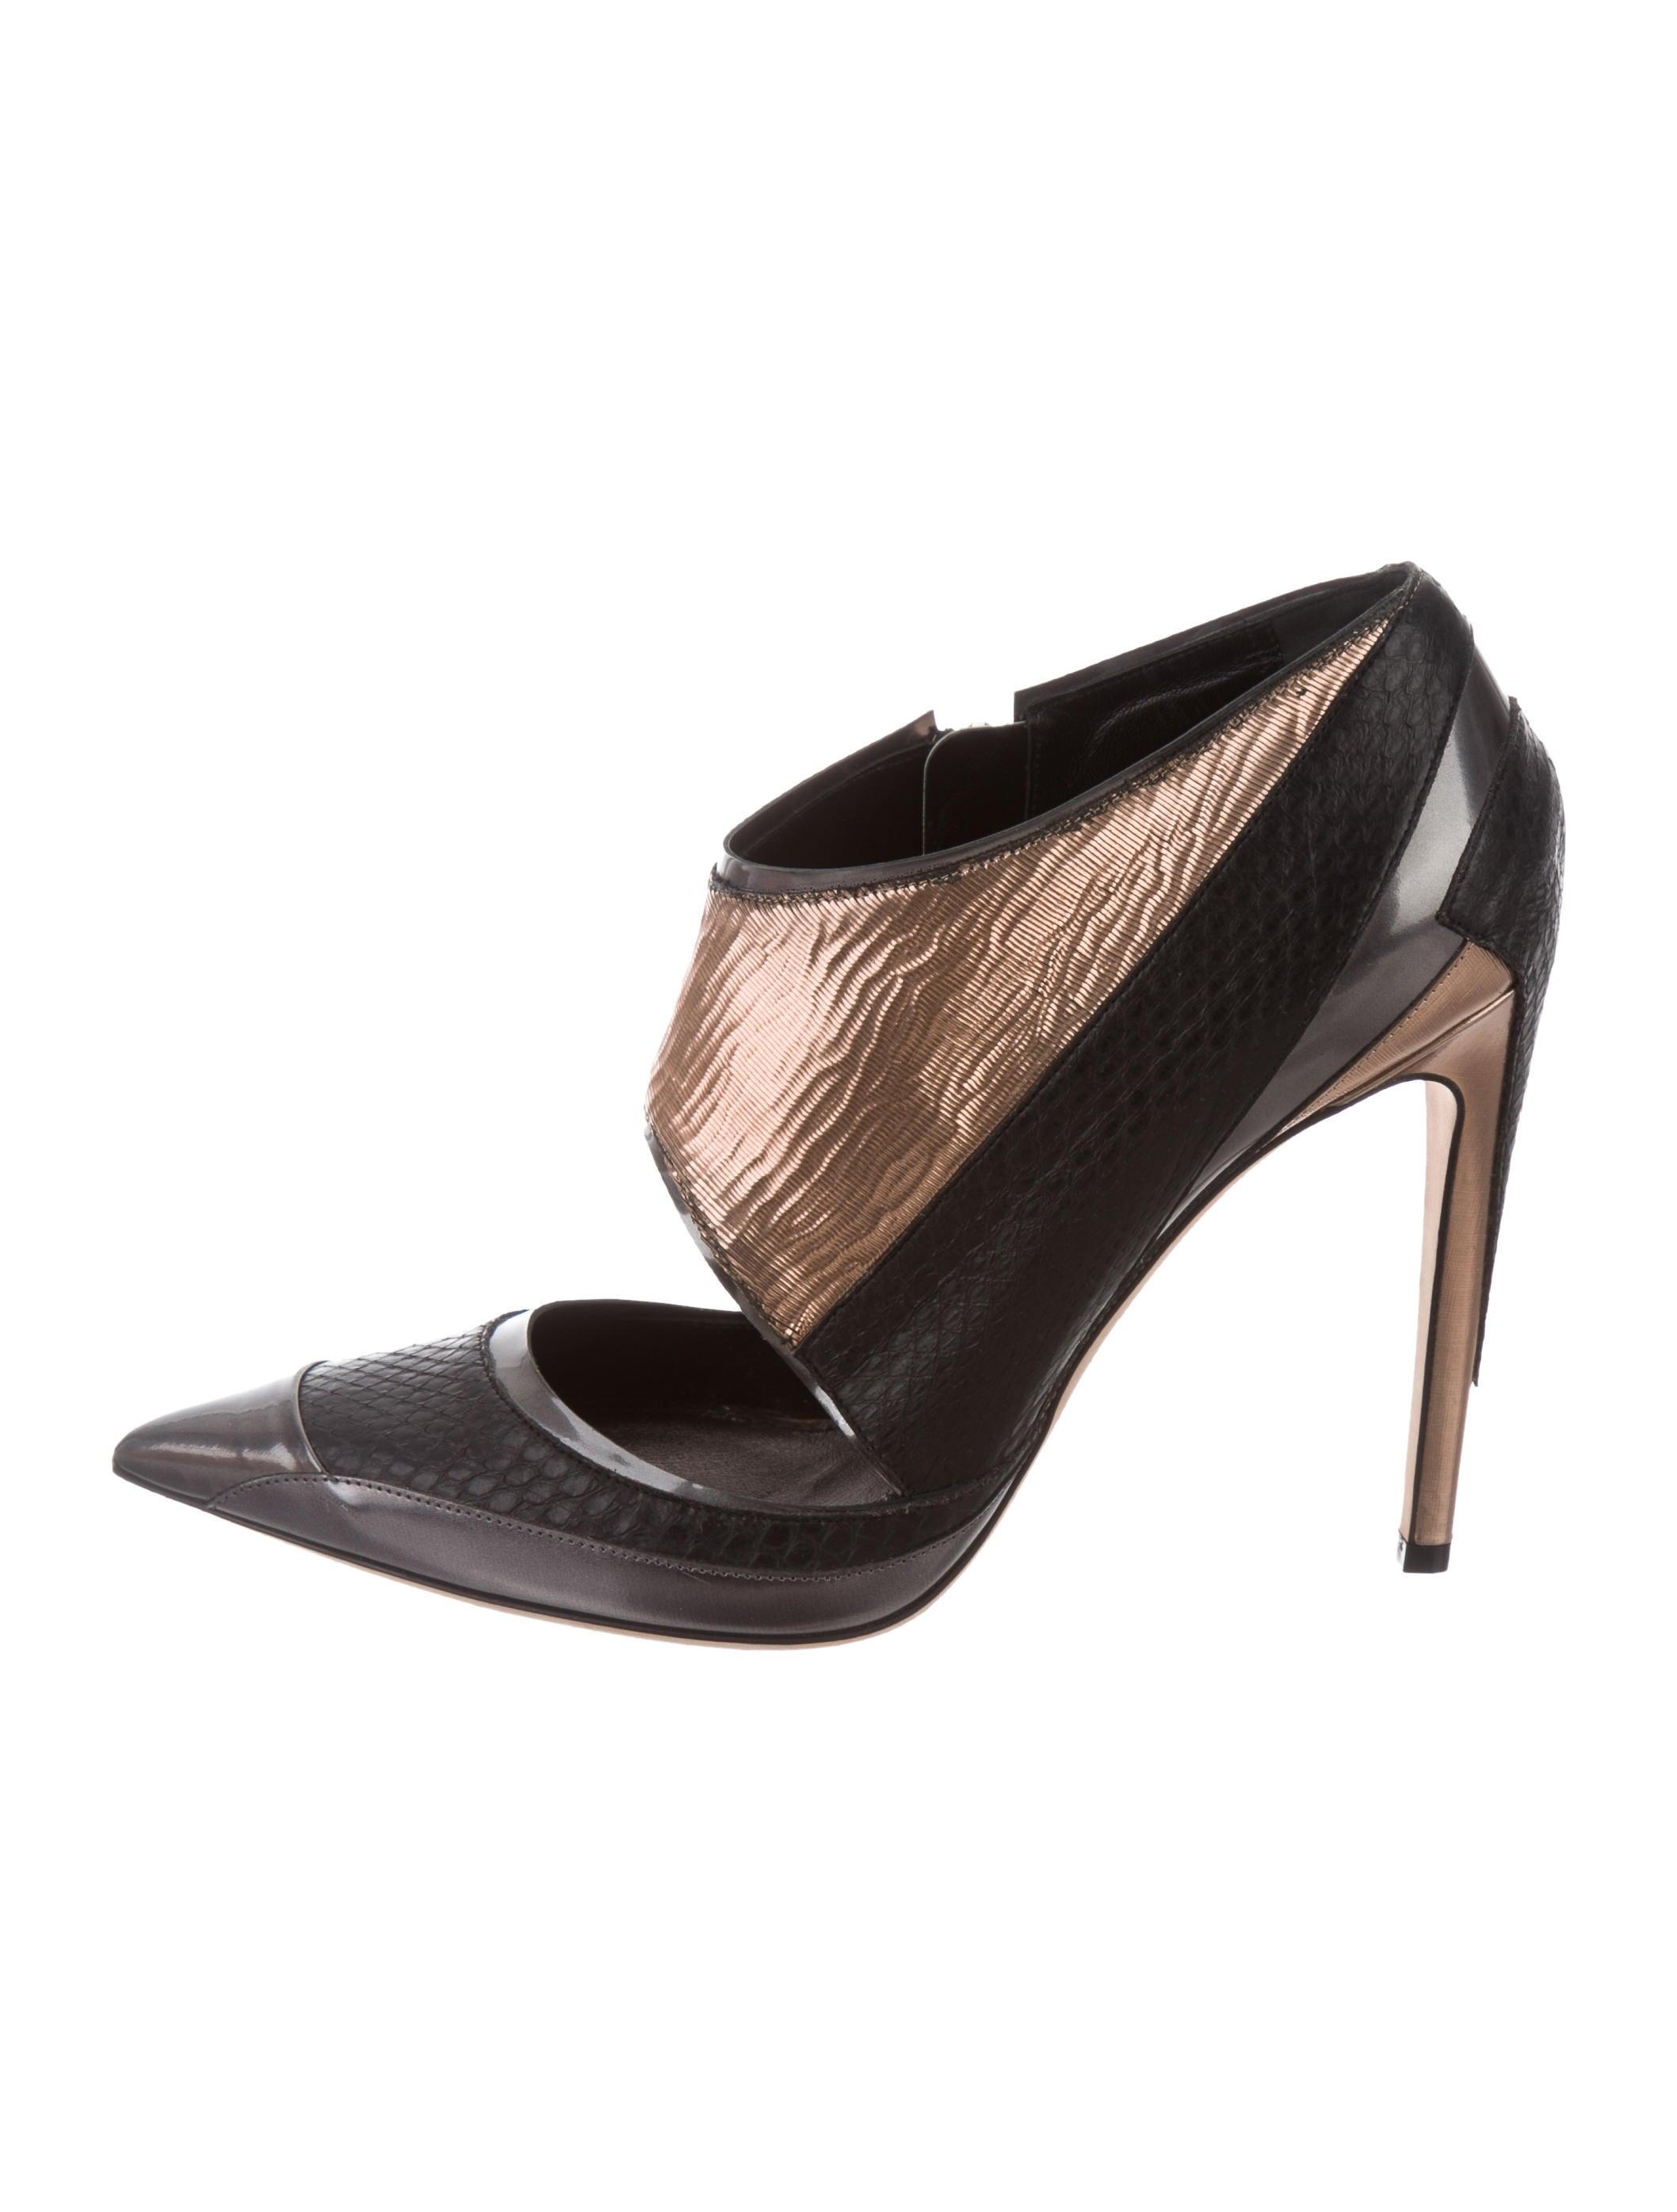 Shop Prabal Gurung Shoes